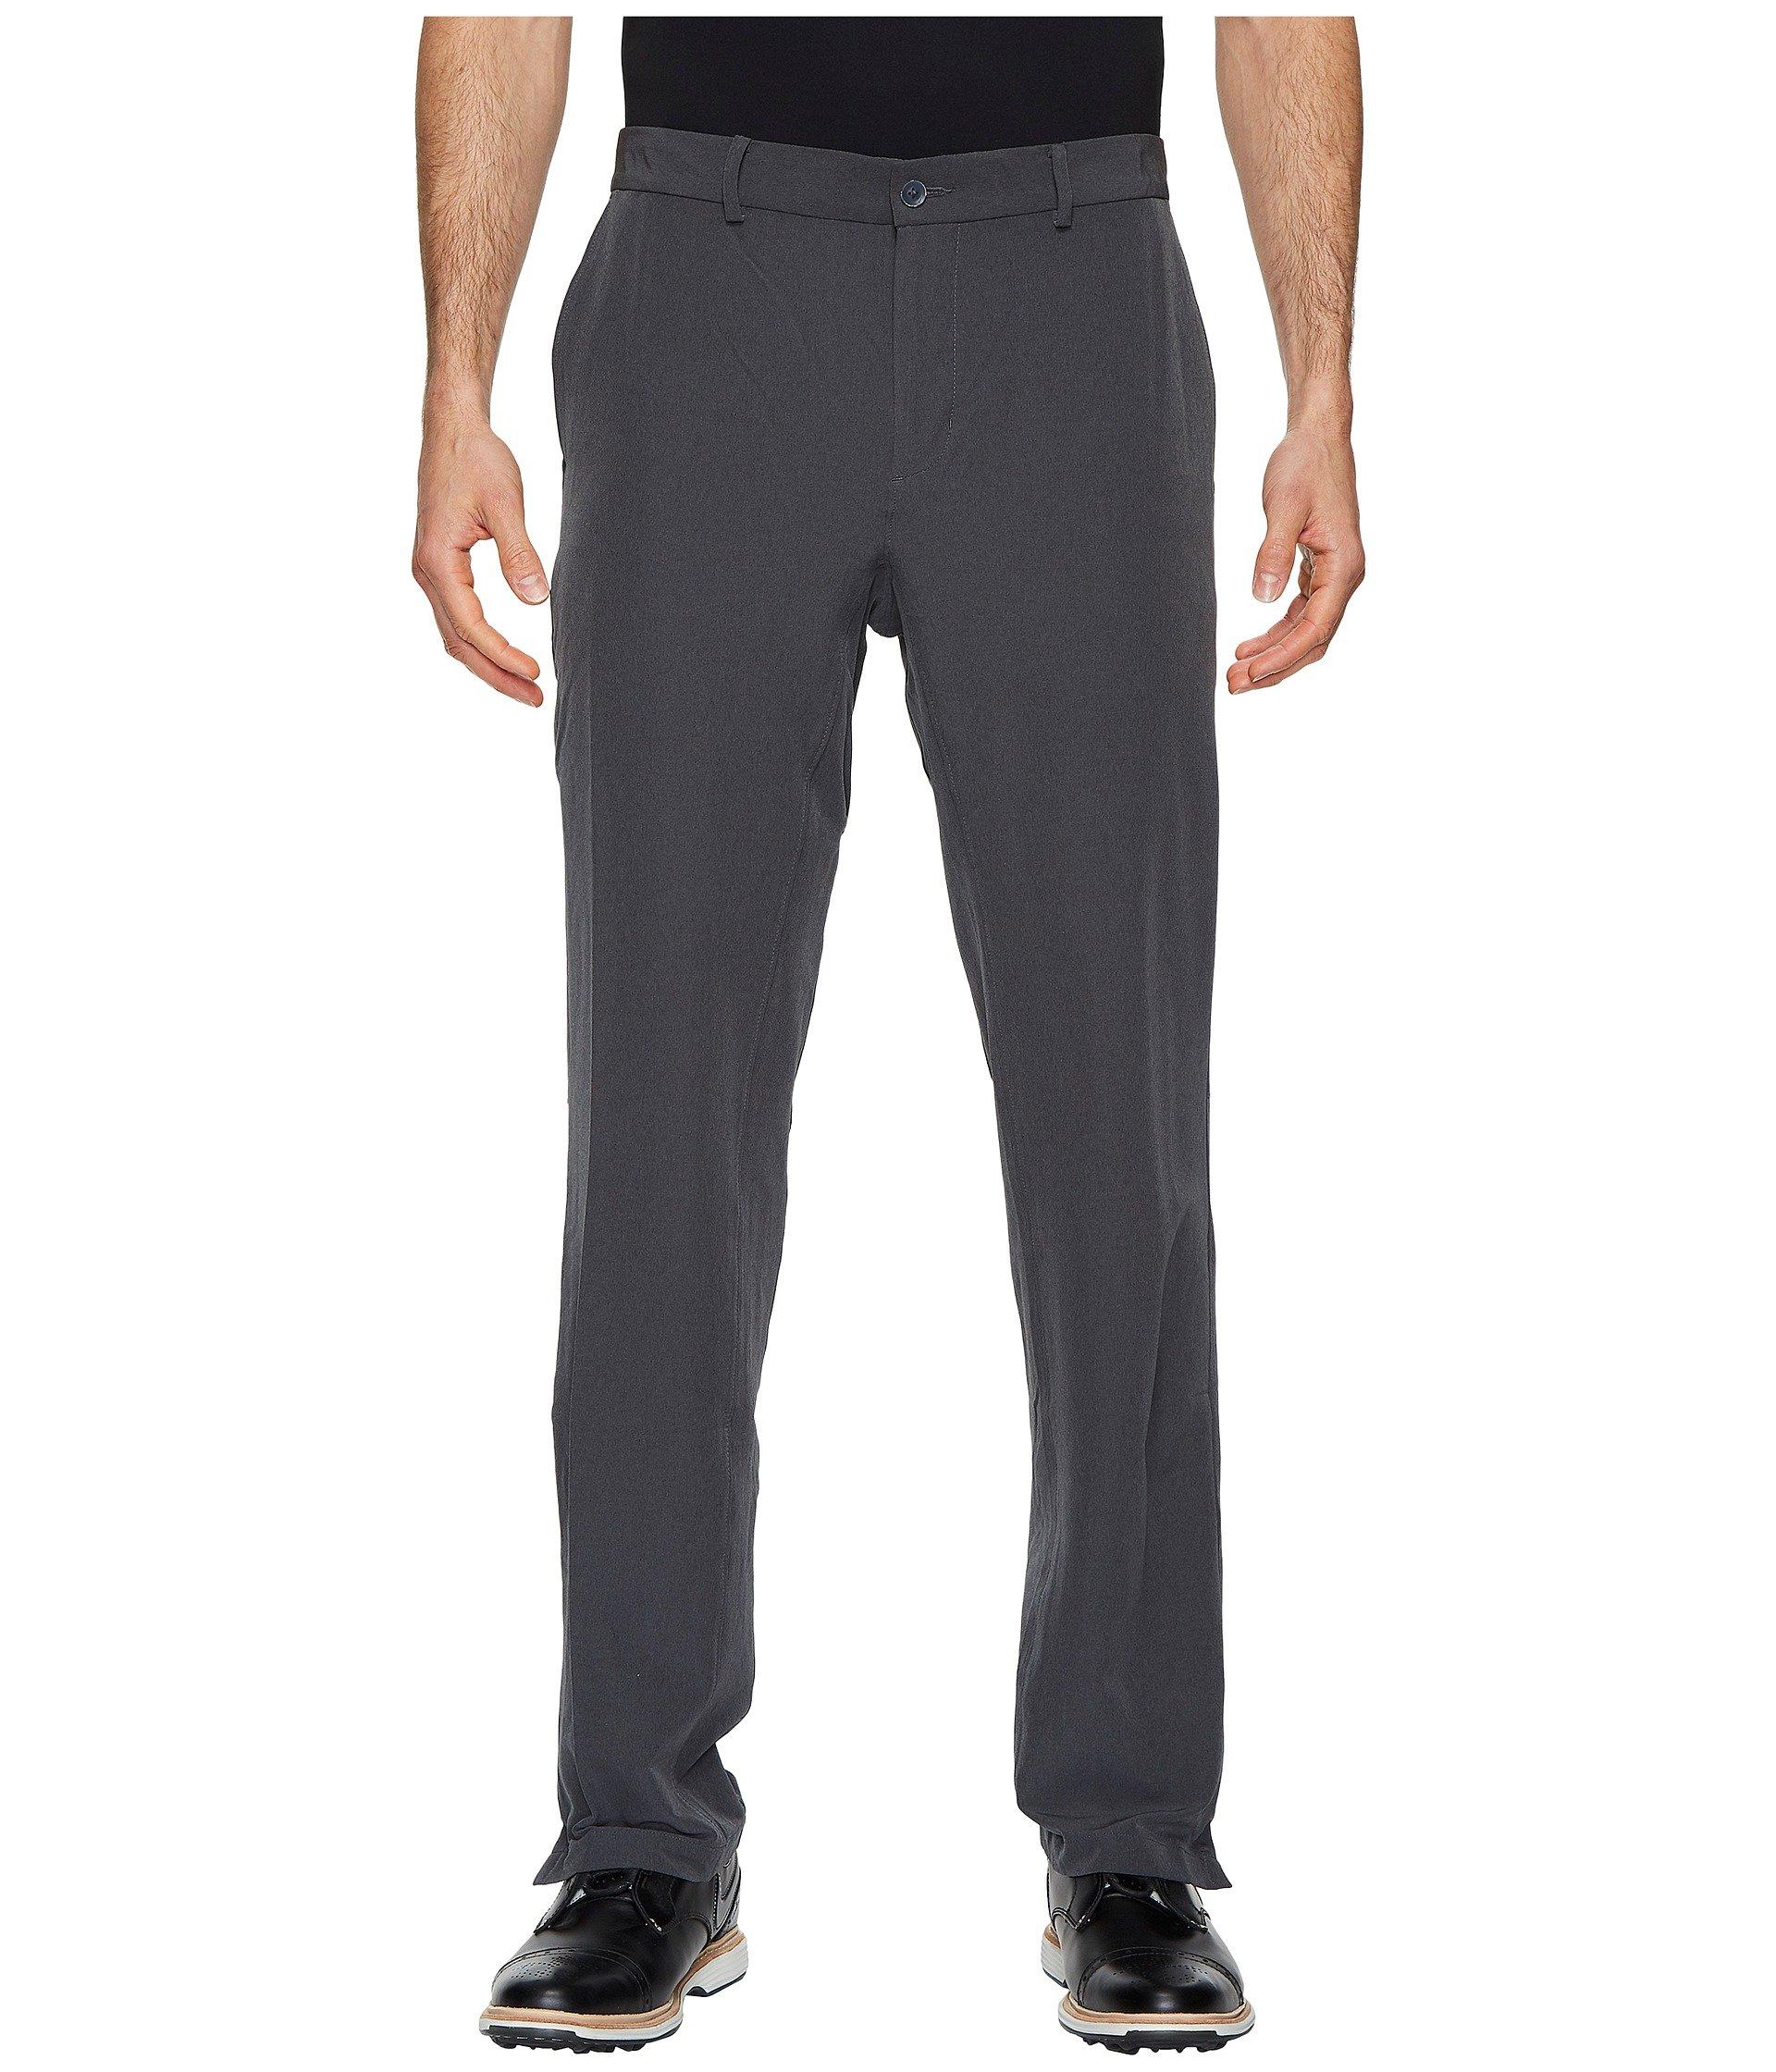 NIKE Men's Flex Hybrid Golf Pants, Charcoal Heather/Dark Grey, Size 34/30 by Nike